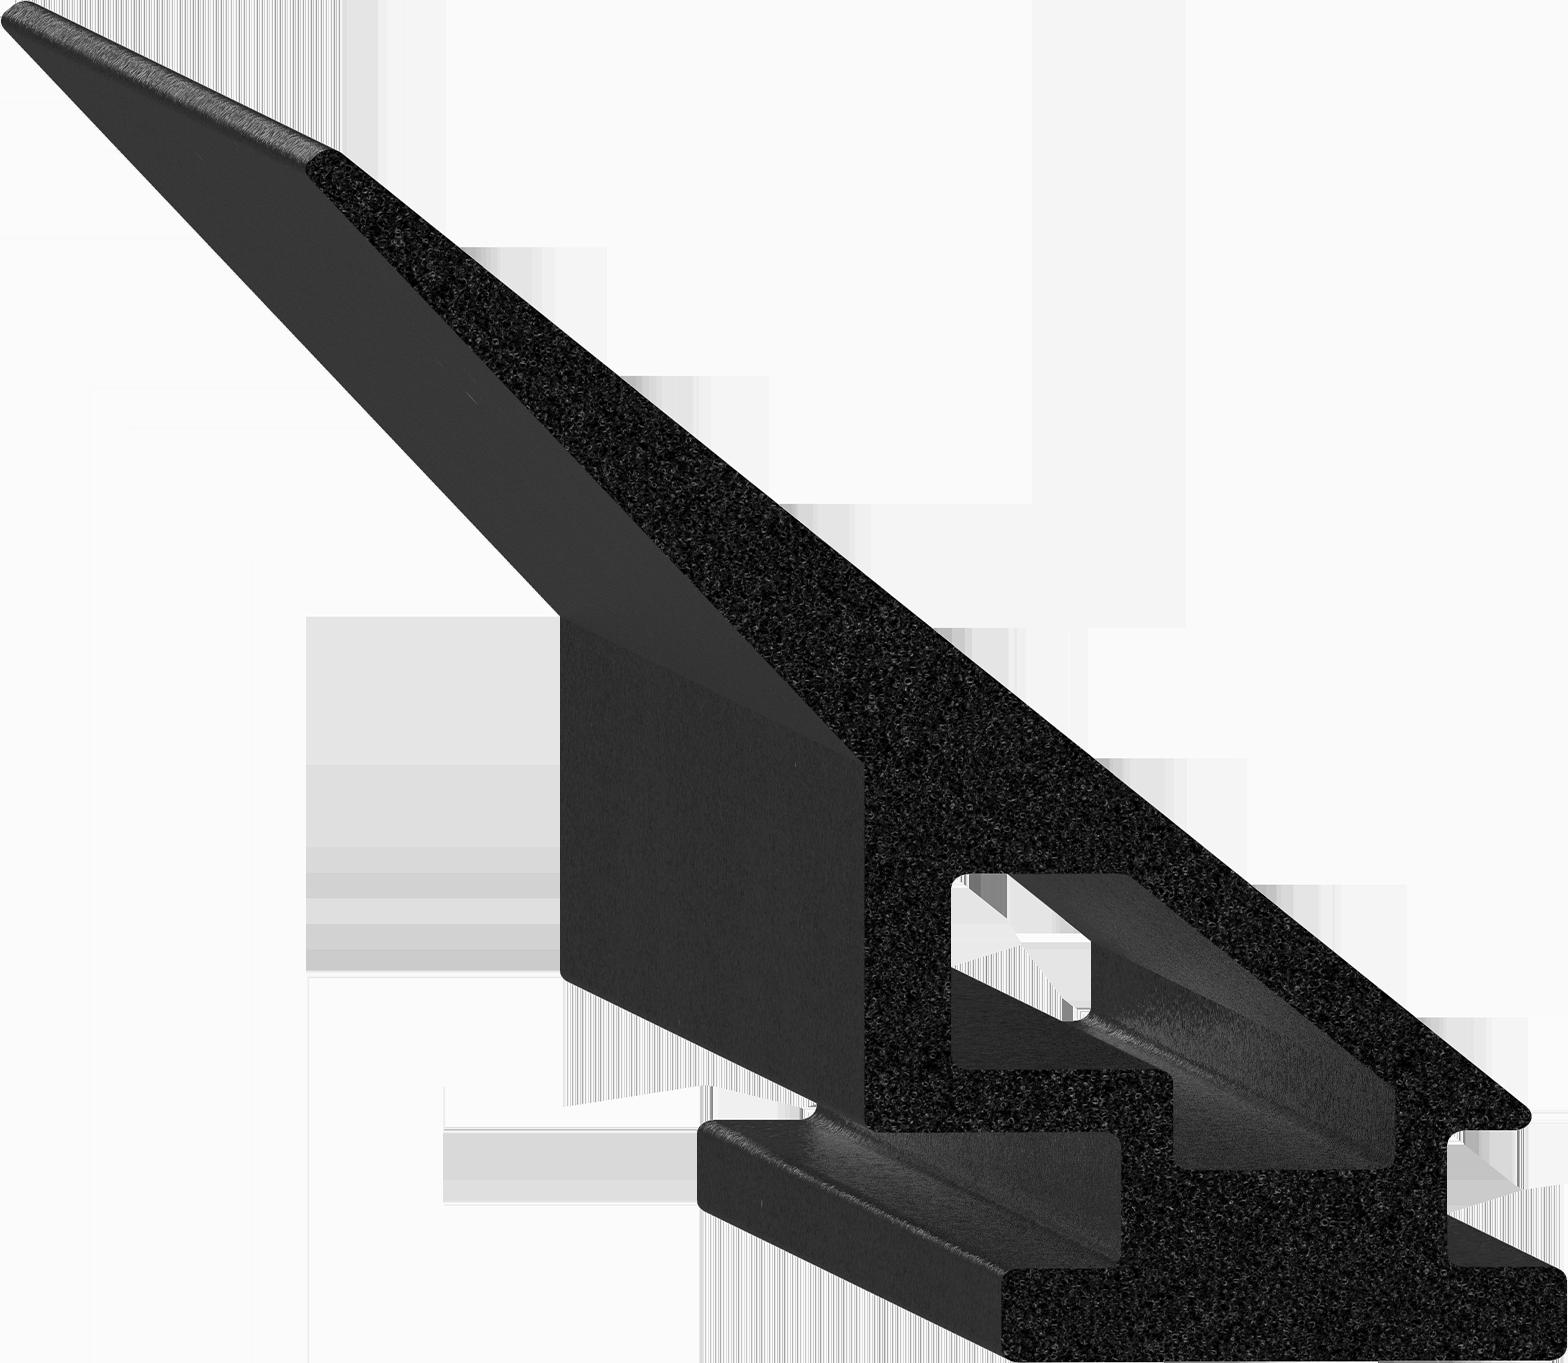 Uni-Grip part: ED-5330